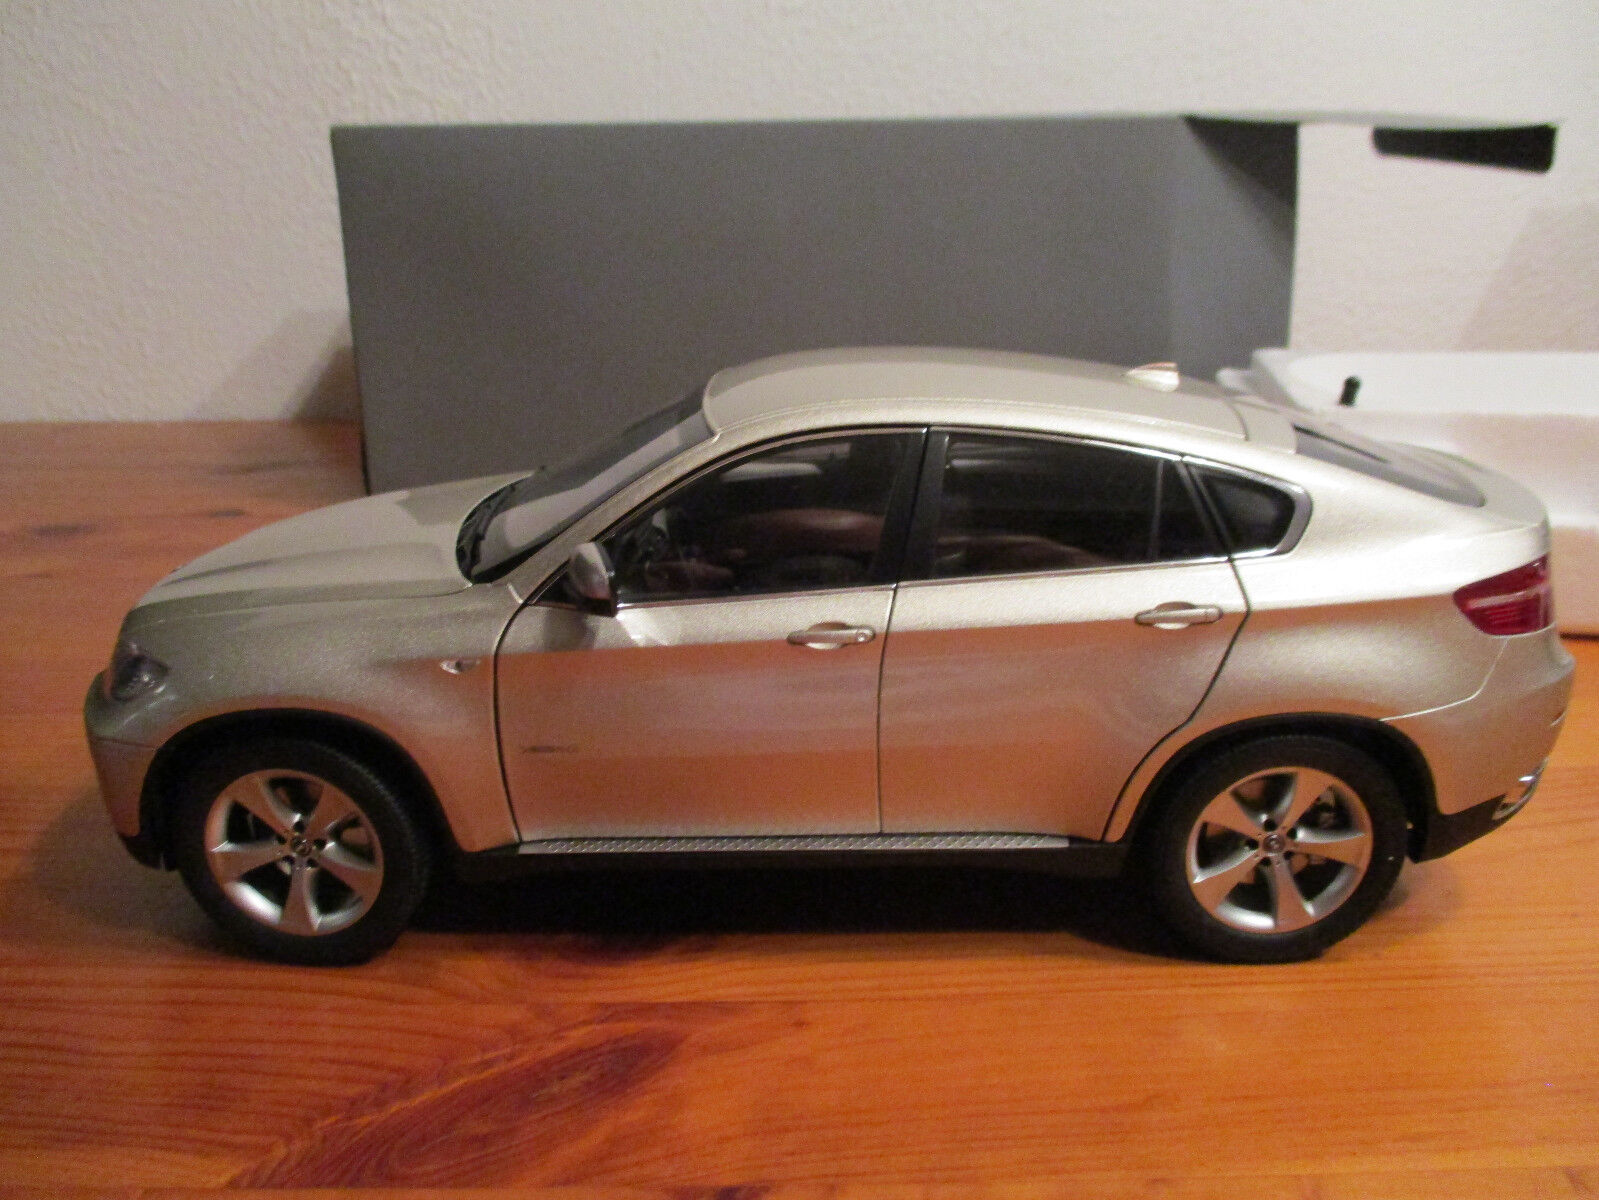 (go) 1 18 Kyosho bmw x6 Drive nuevo embalaje original